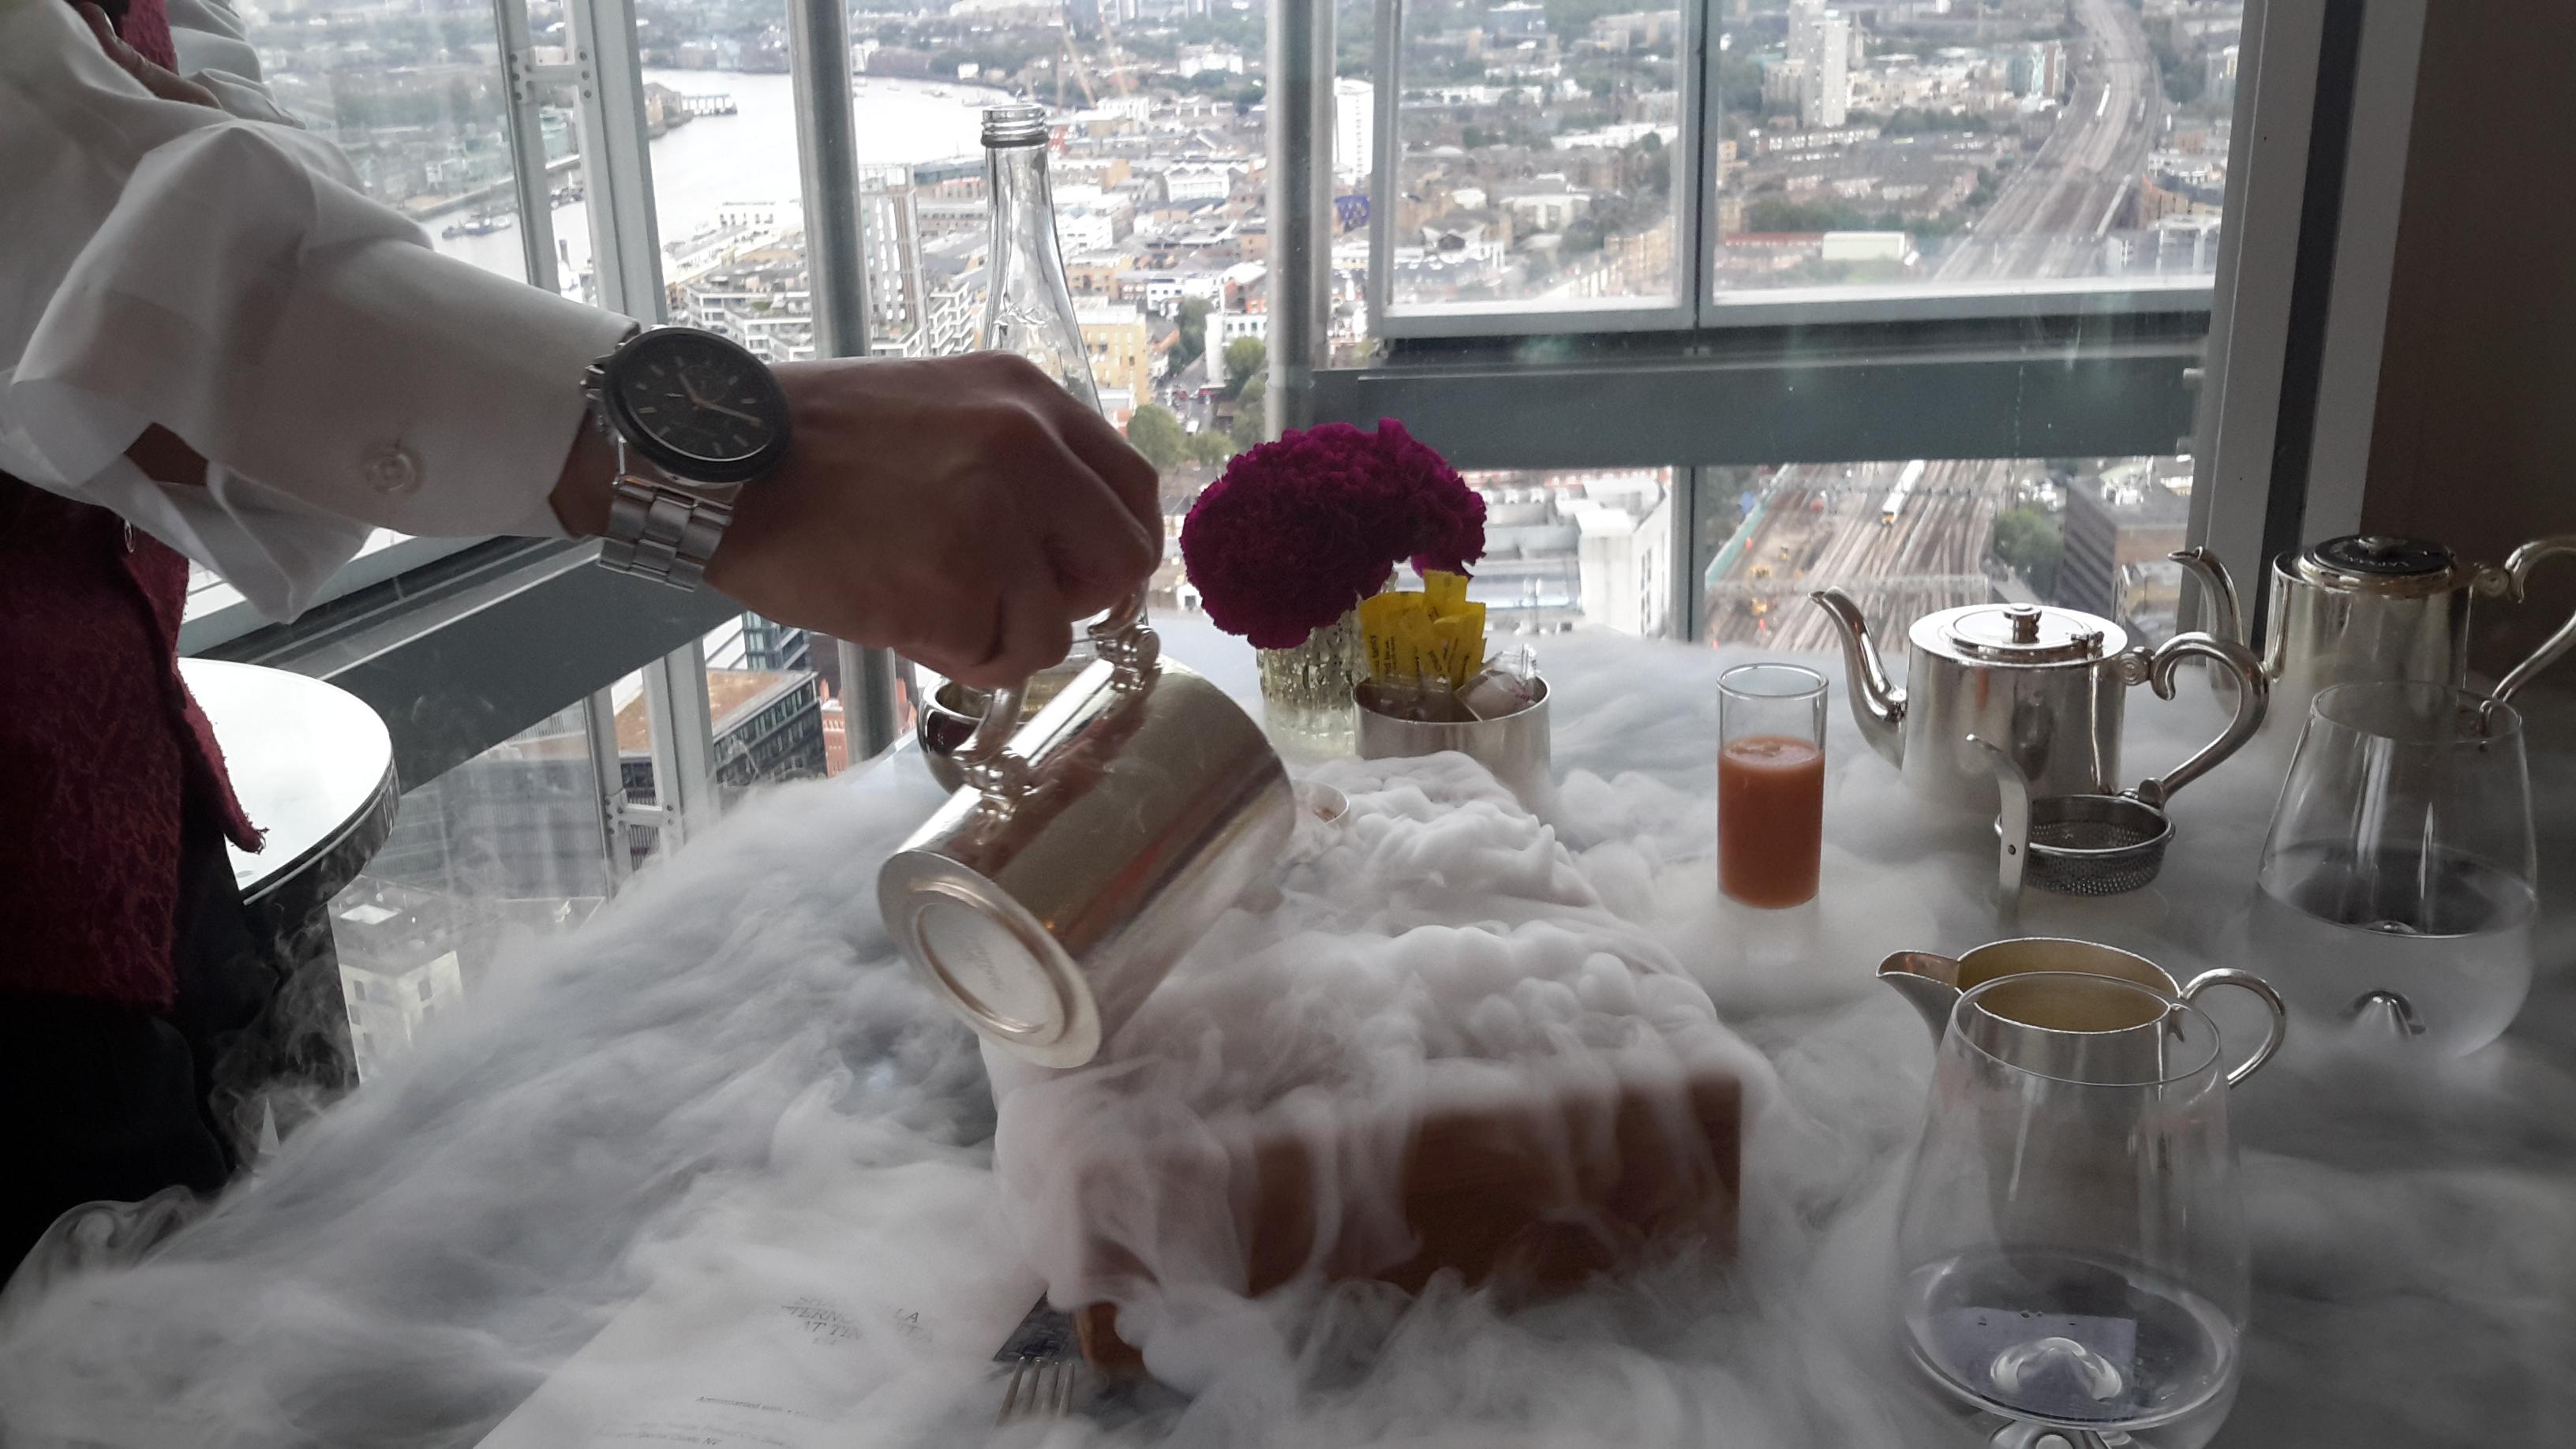 Shangri La Hotel Afternoon Tea Menu